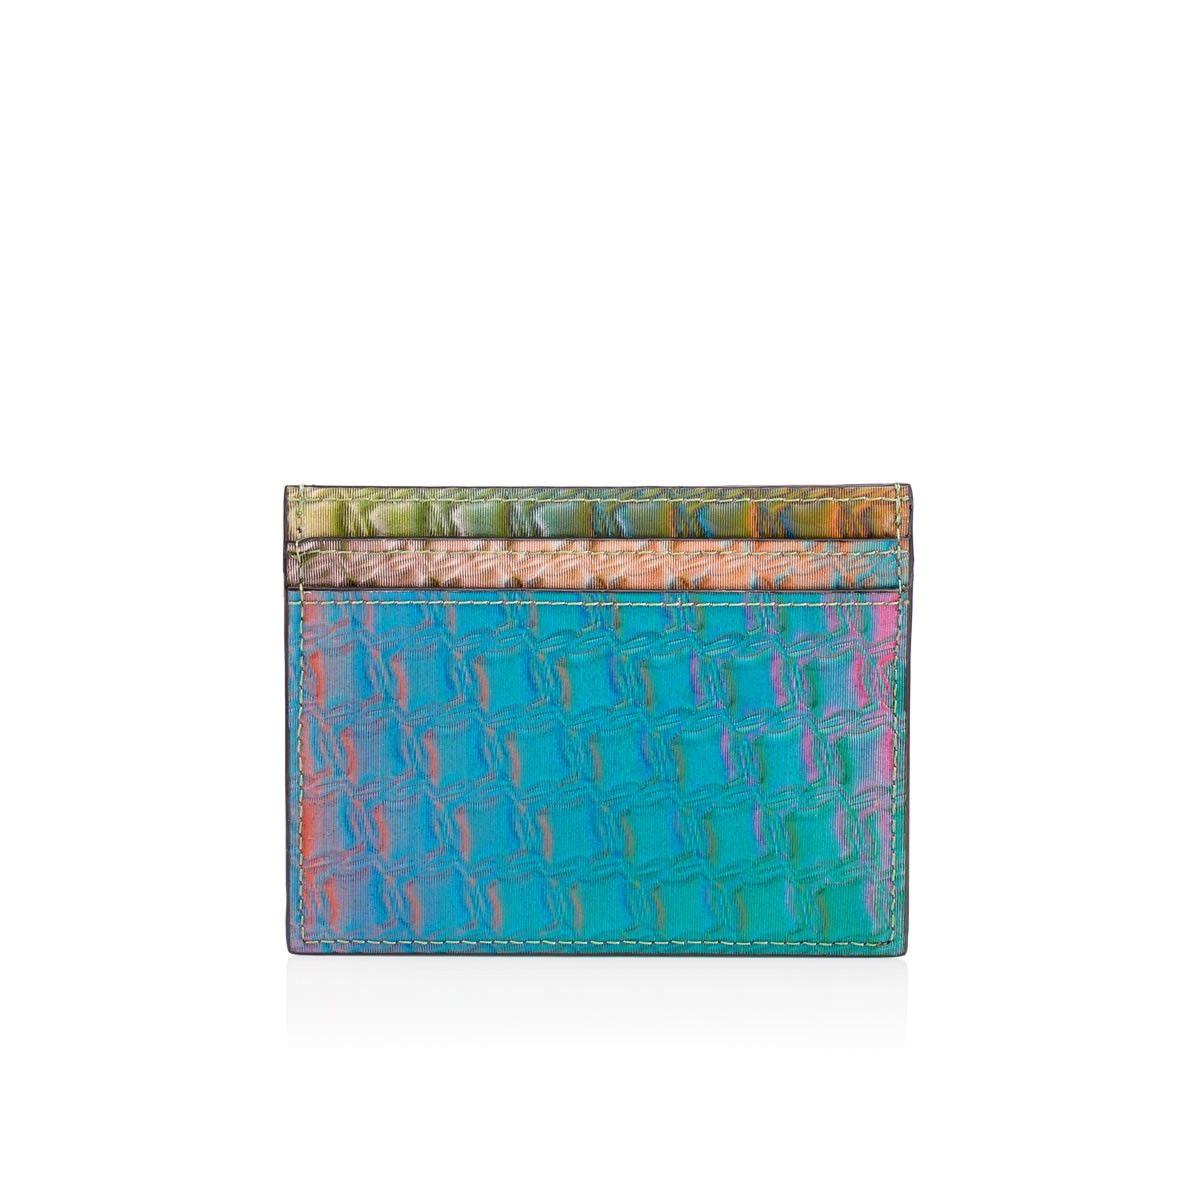 Christian Louboutin Kios Simple Card Holder Multi Hologram Canvas Handbags Christian Louboutin Canvas Handbags Christian Louboutin Men Christian Louboutin